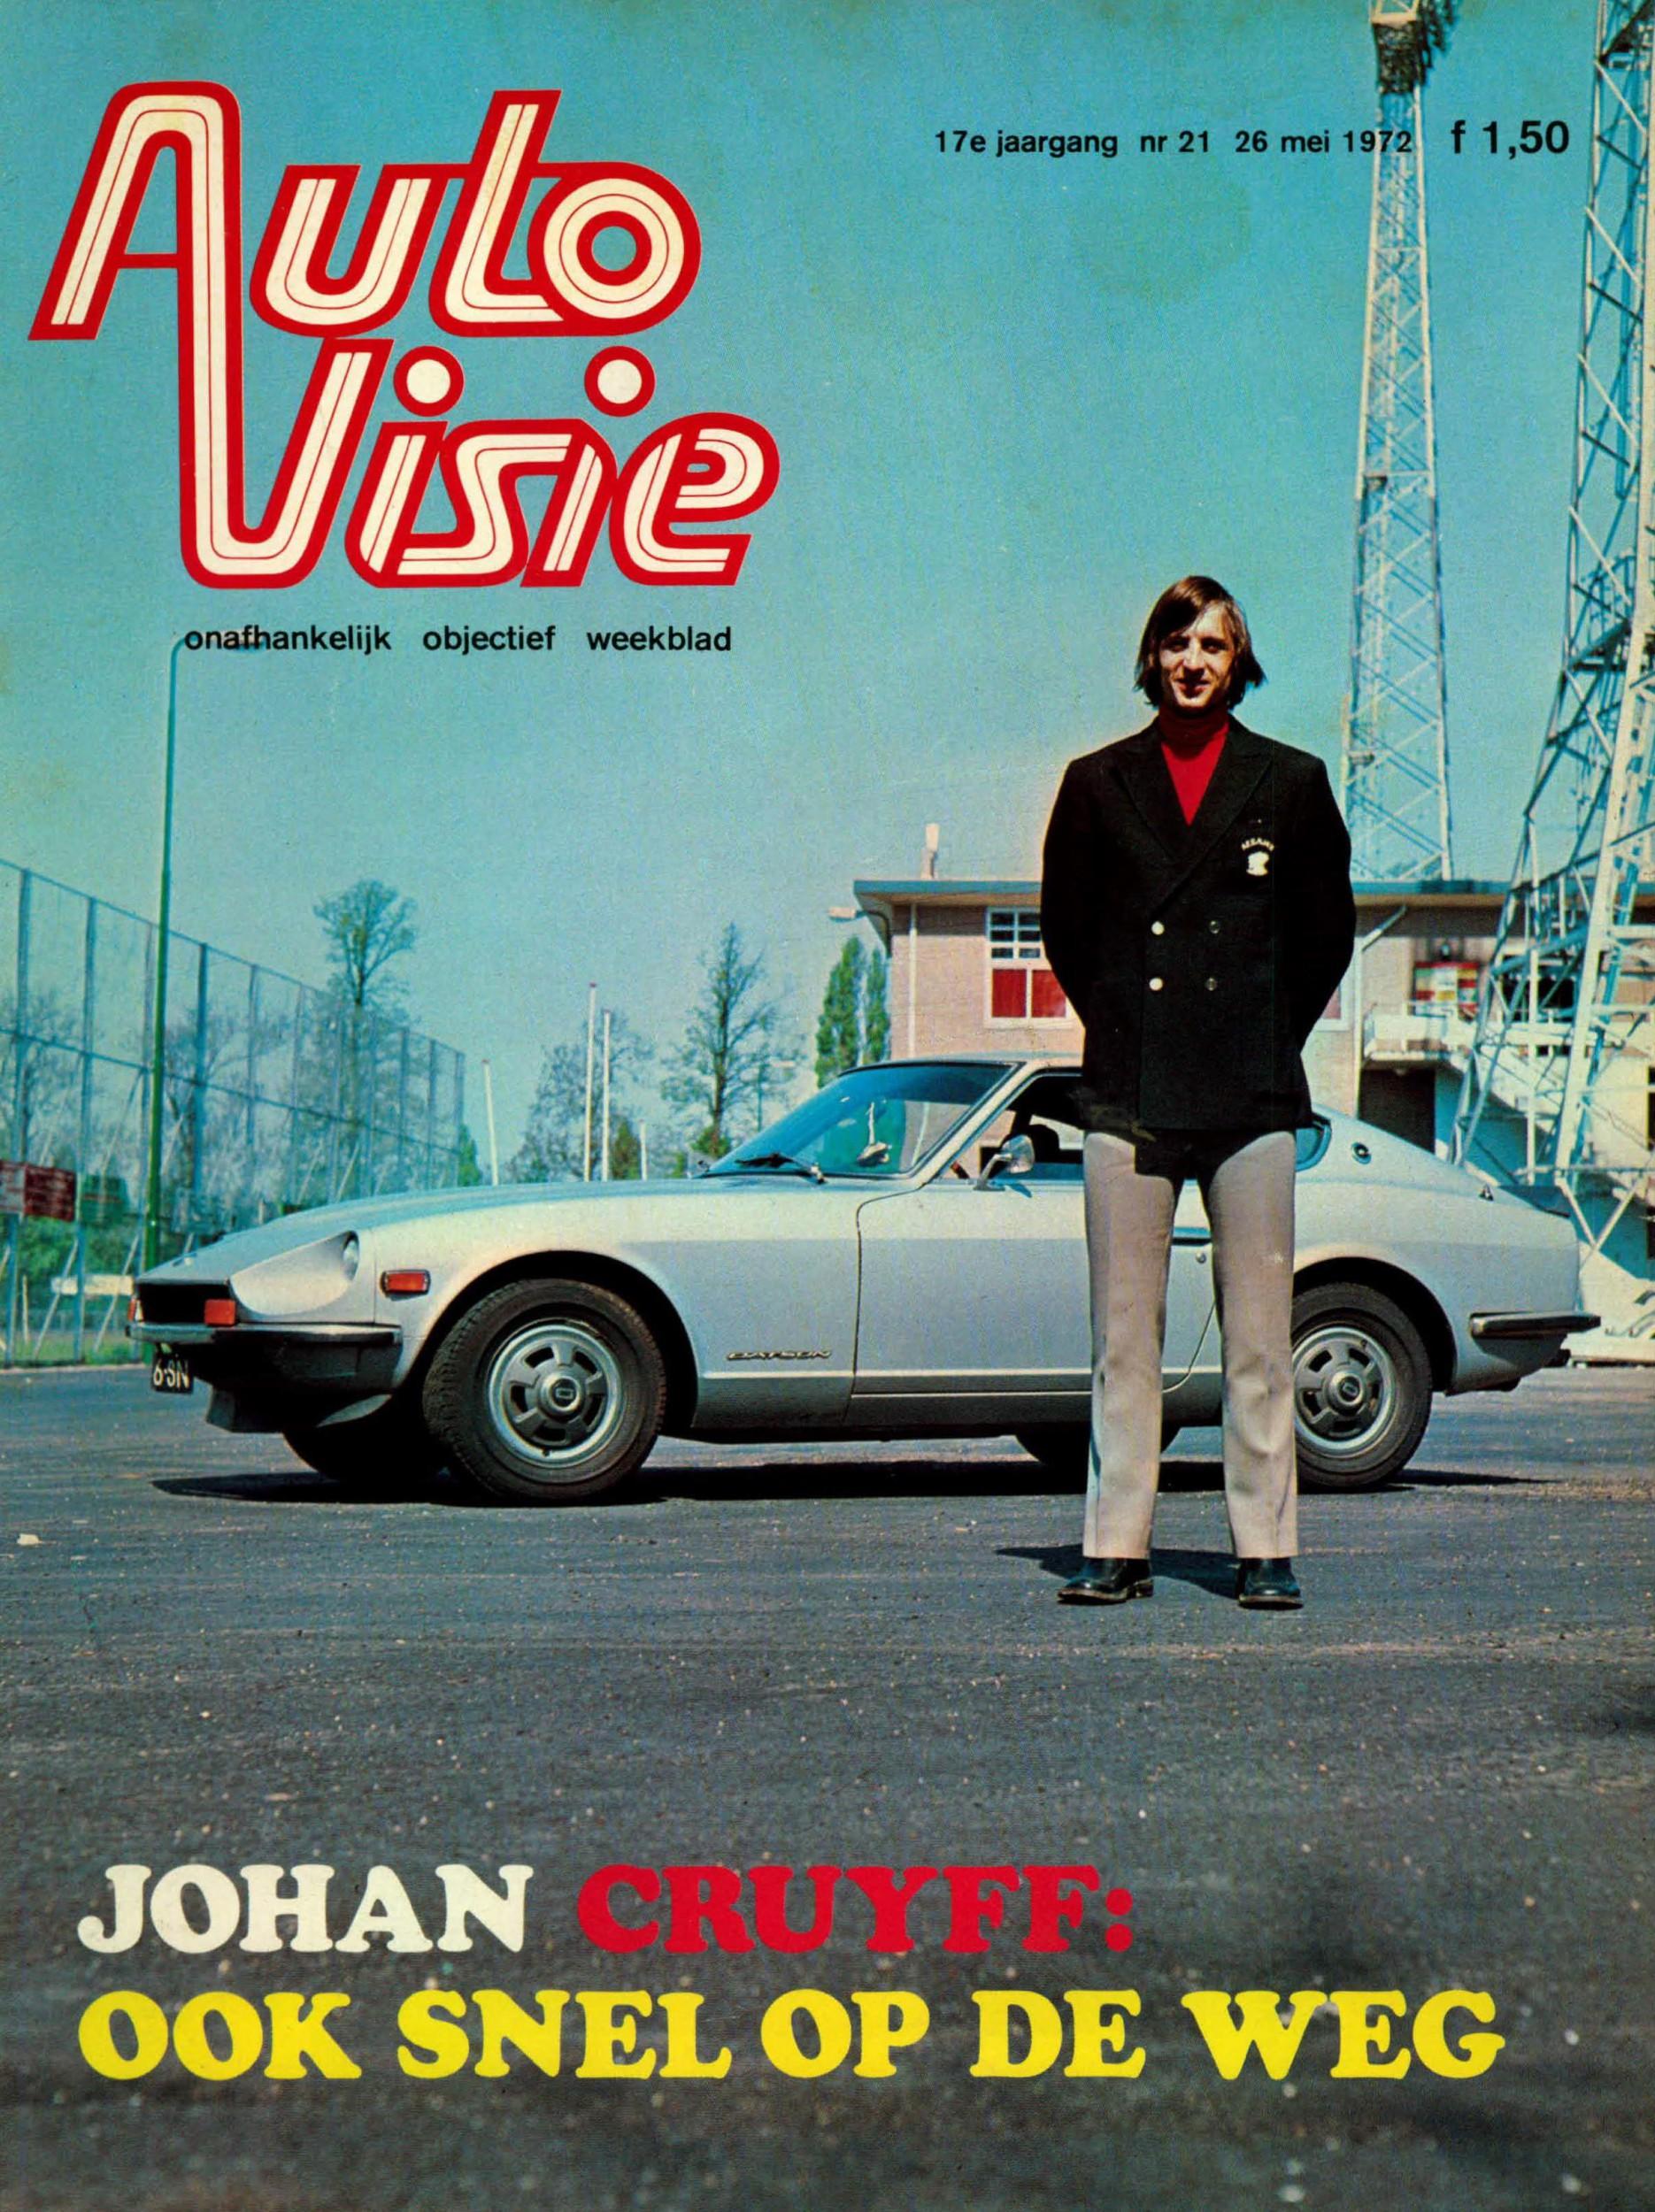 Autovisie cover Johan Cruijff